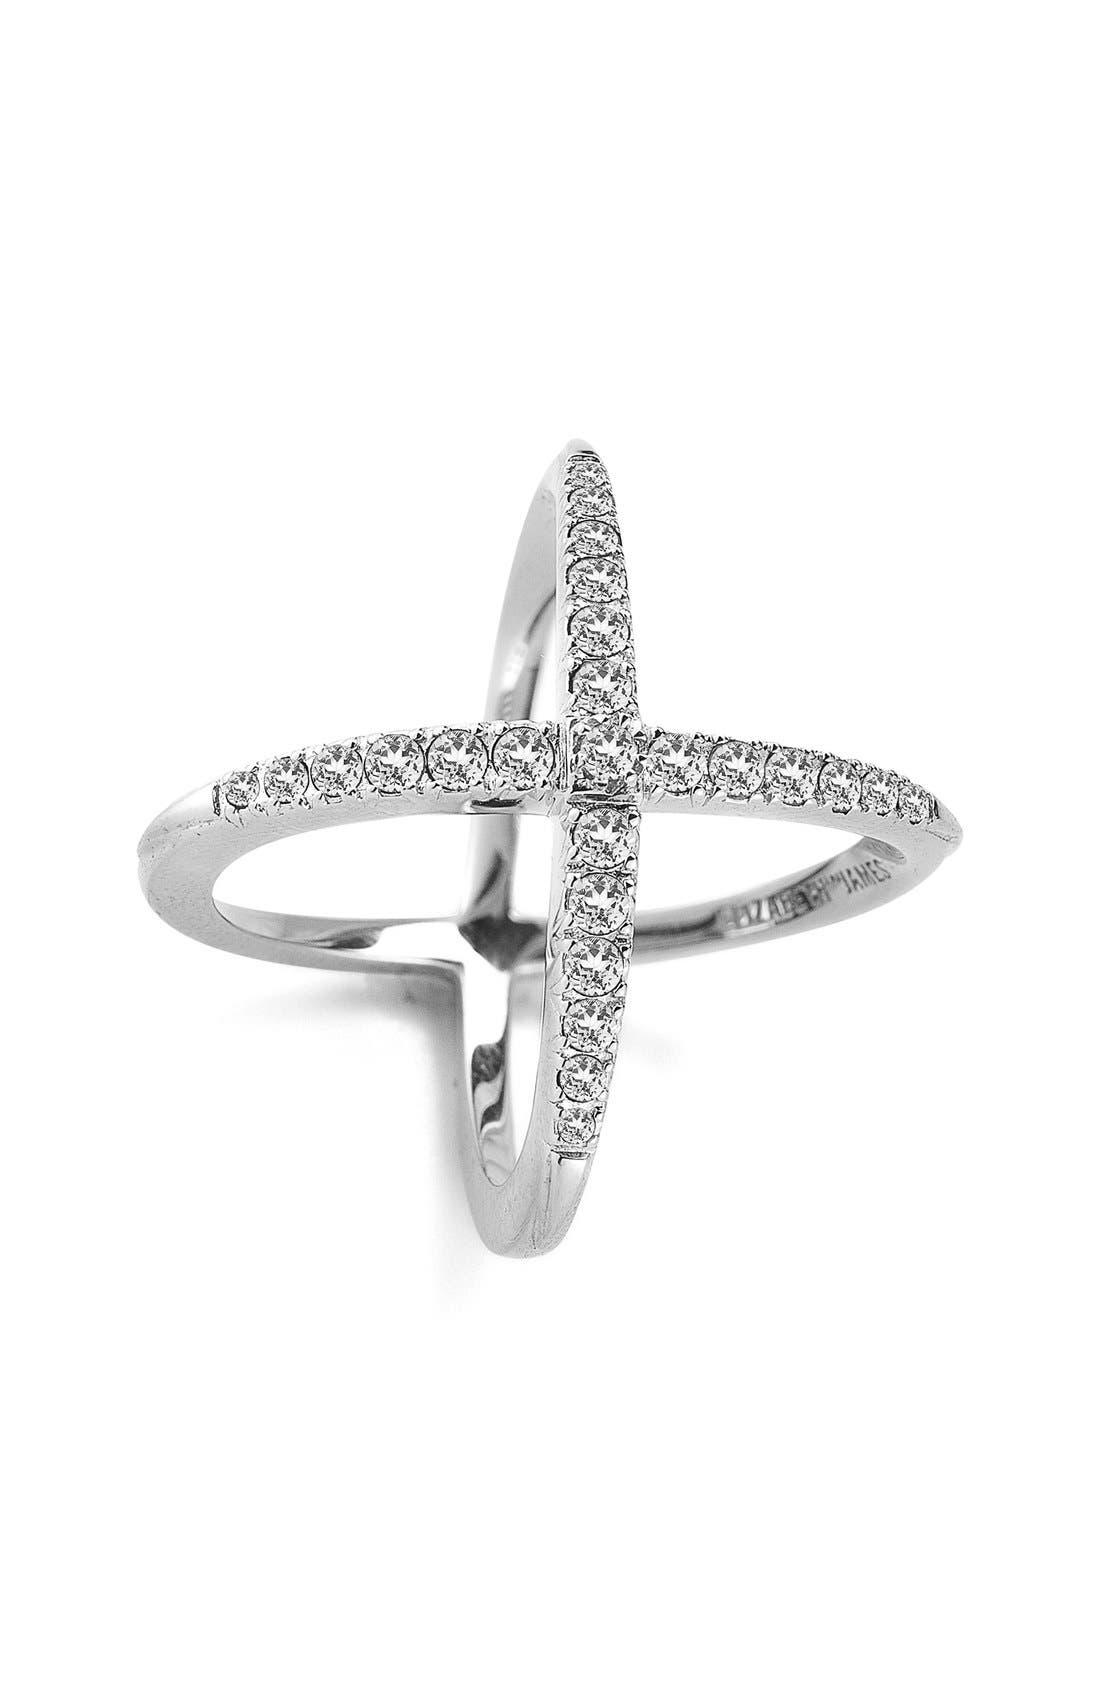 'Windrose' Pavé White Topaz Ring,                             Main thumbnail 1, color,                             White Topaz/ Silver